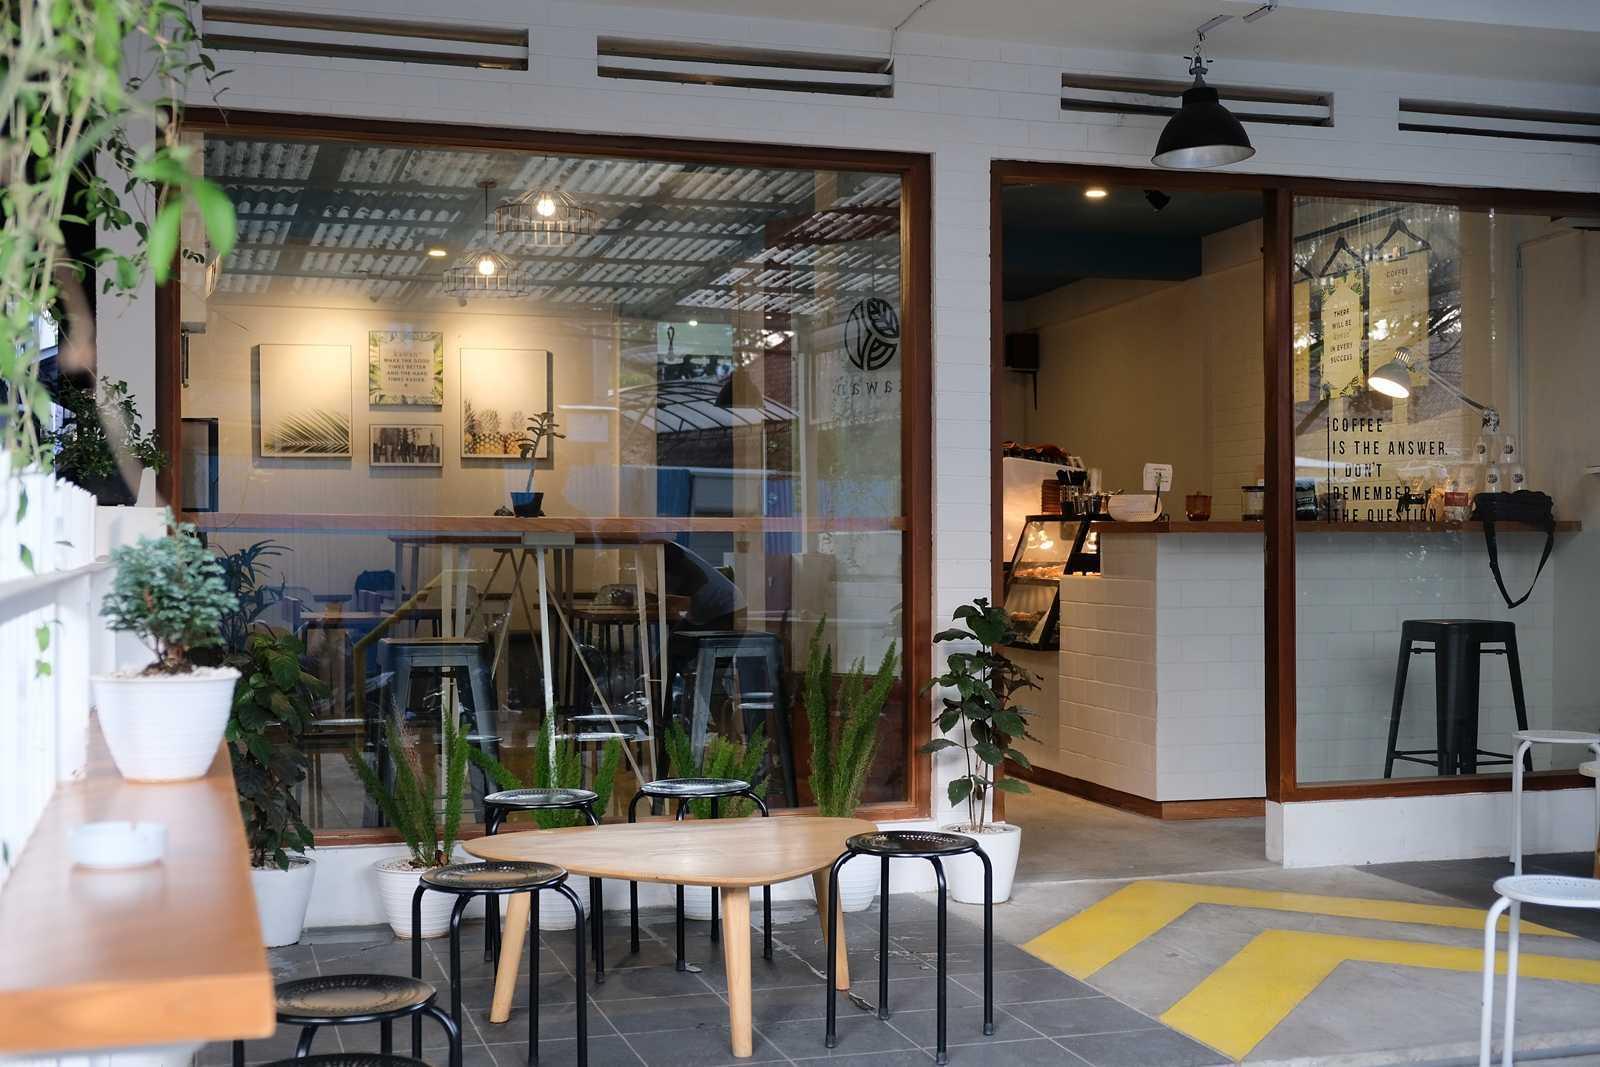 Jasa Design and Build PT Keranji Jaya Kreatif di Bandung